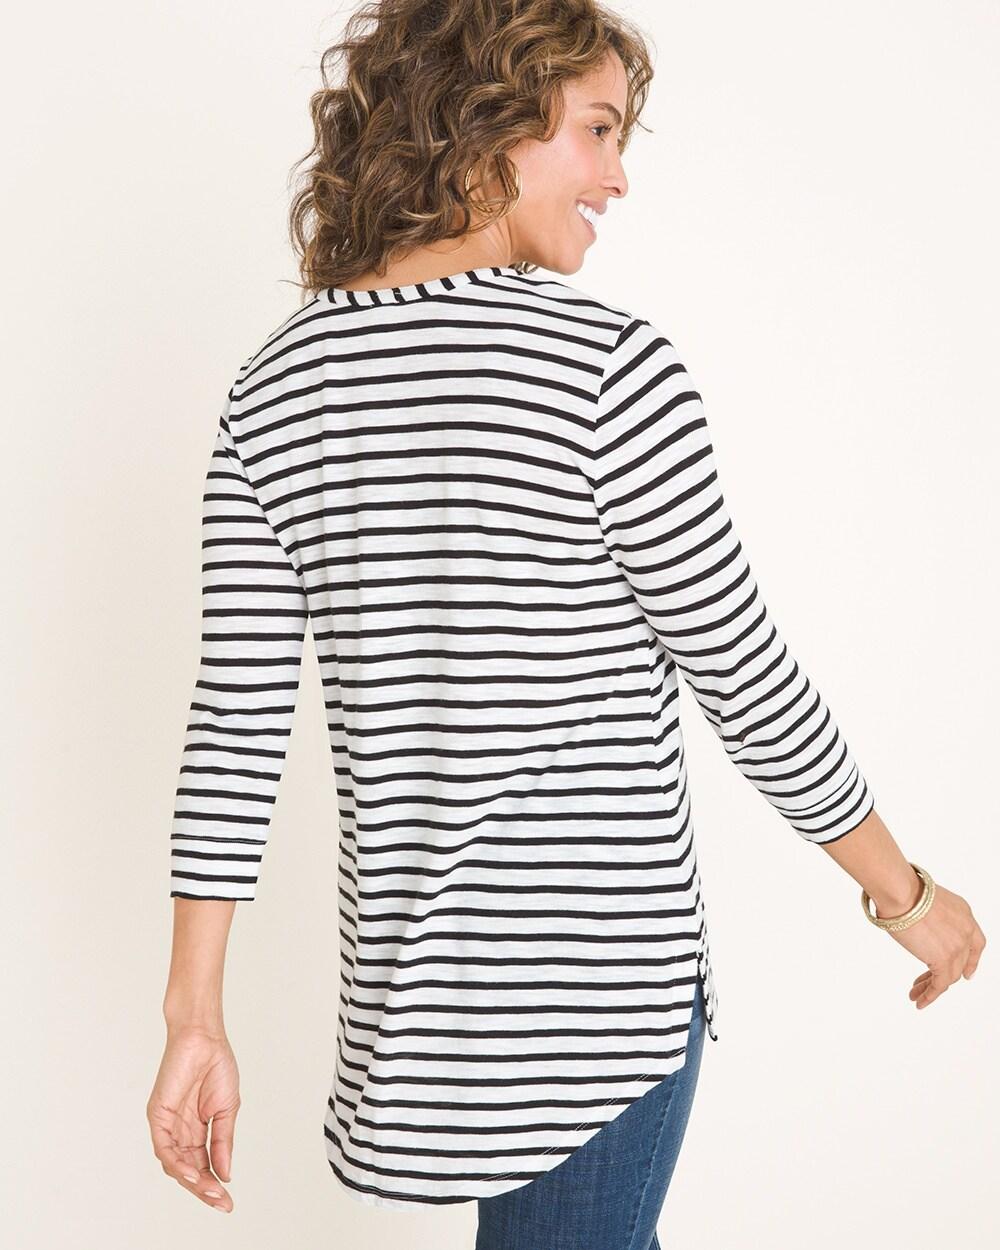 8e89f432 Return to thumbnail image selection Cotton-Blend Slub Striped 3/4-Sleeve Top